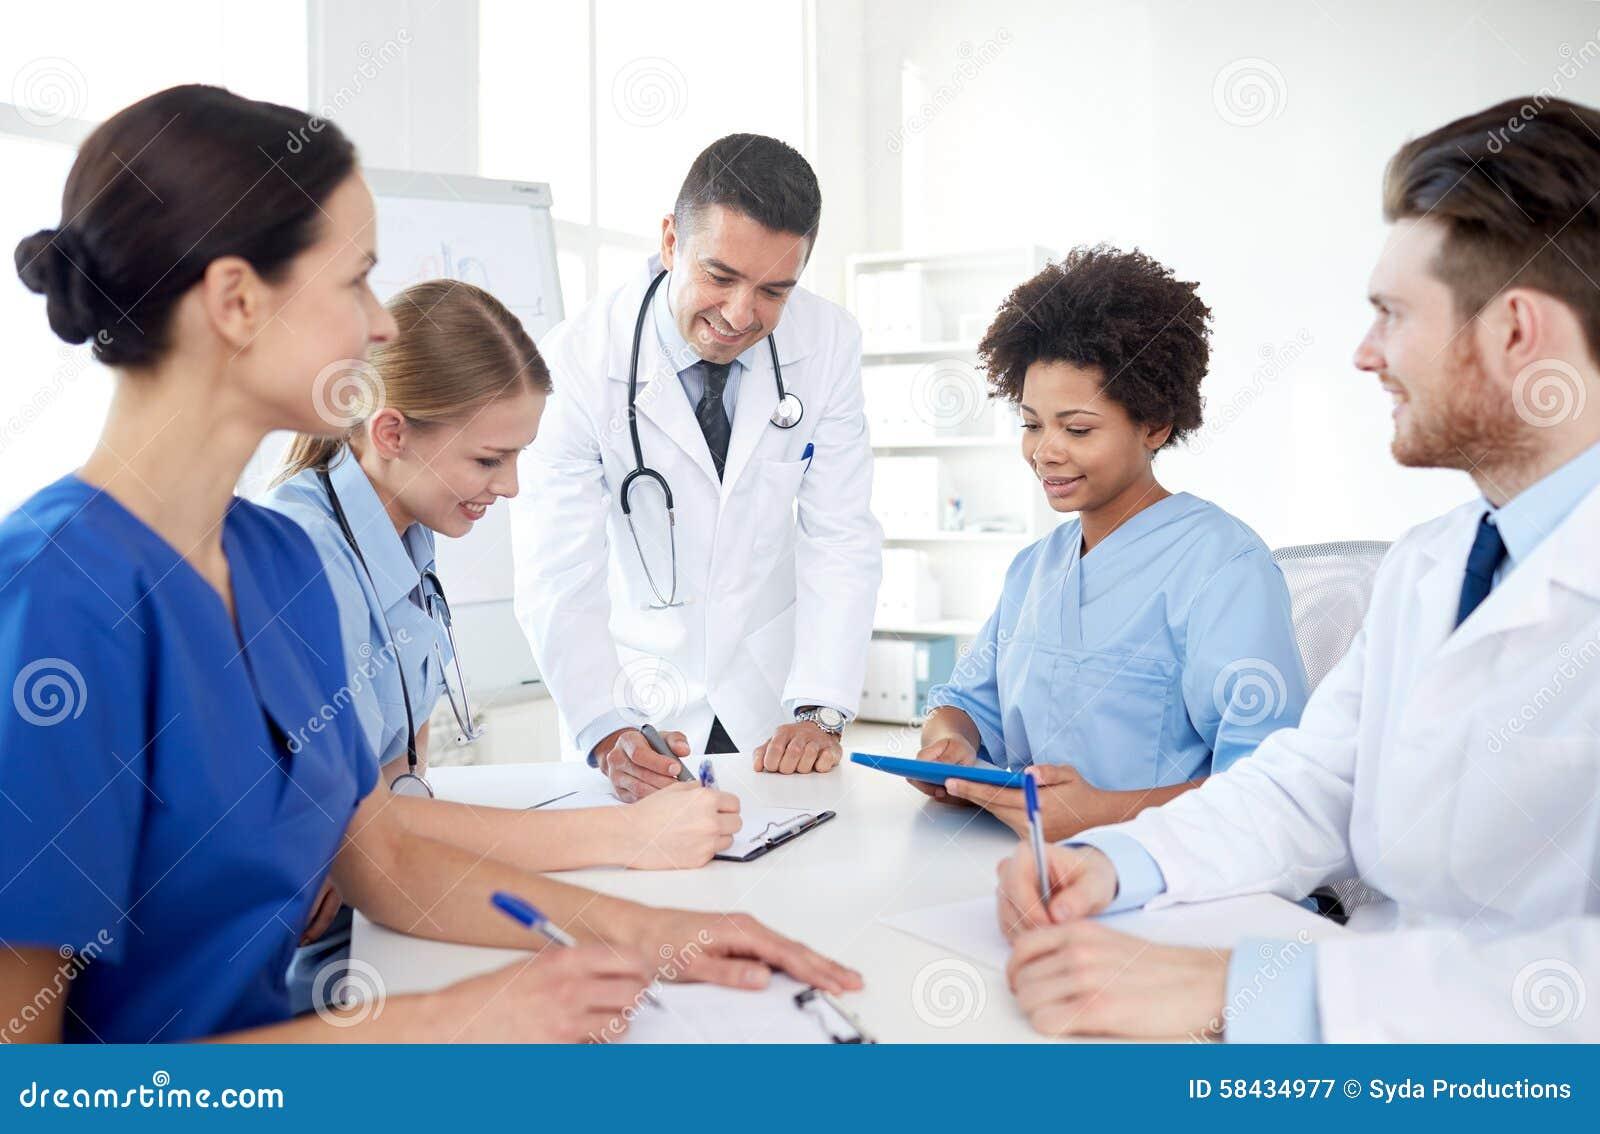 training center business plan doctors